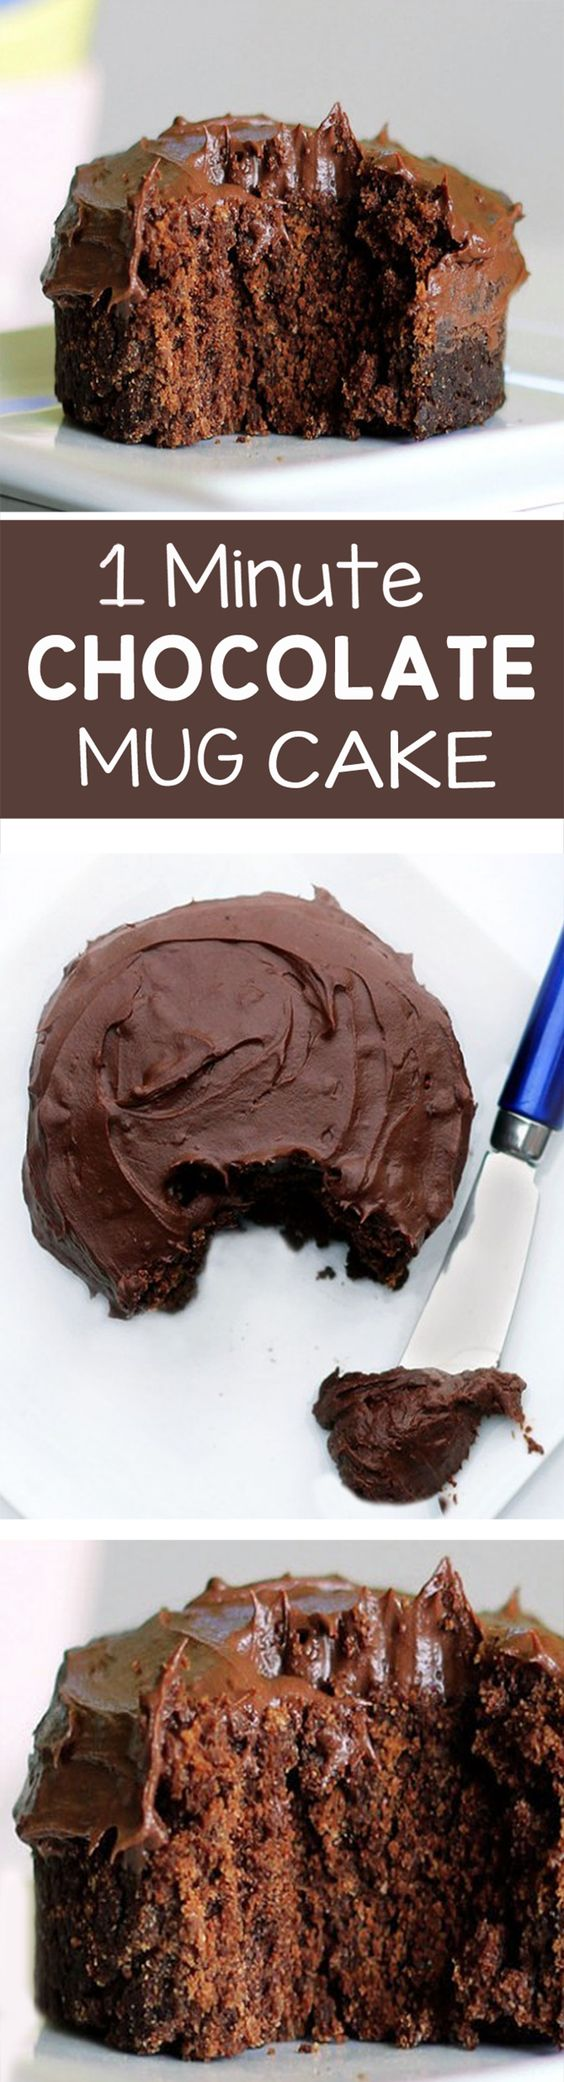 ideas and more chocolate cakes 200 calories chocolate cakes mug cakes ...